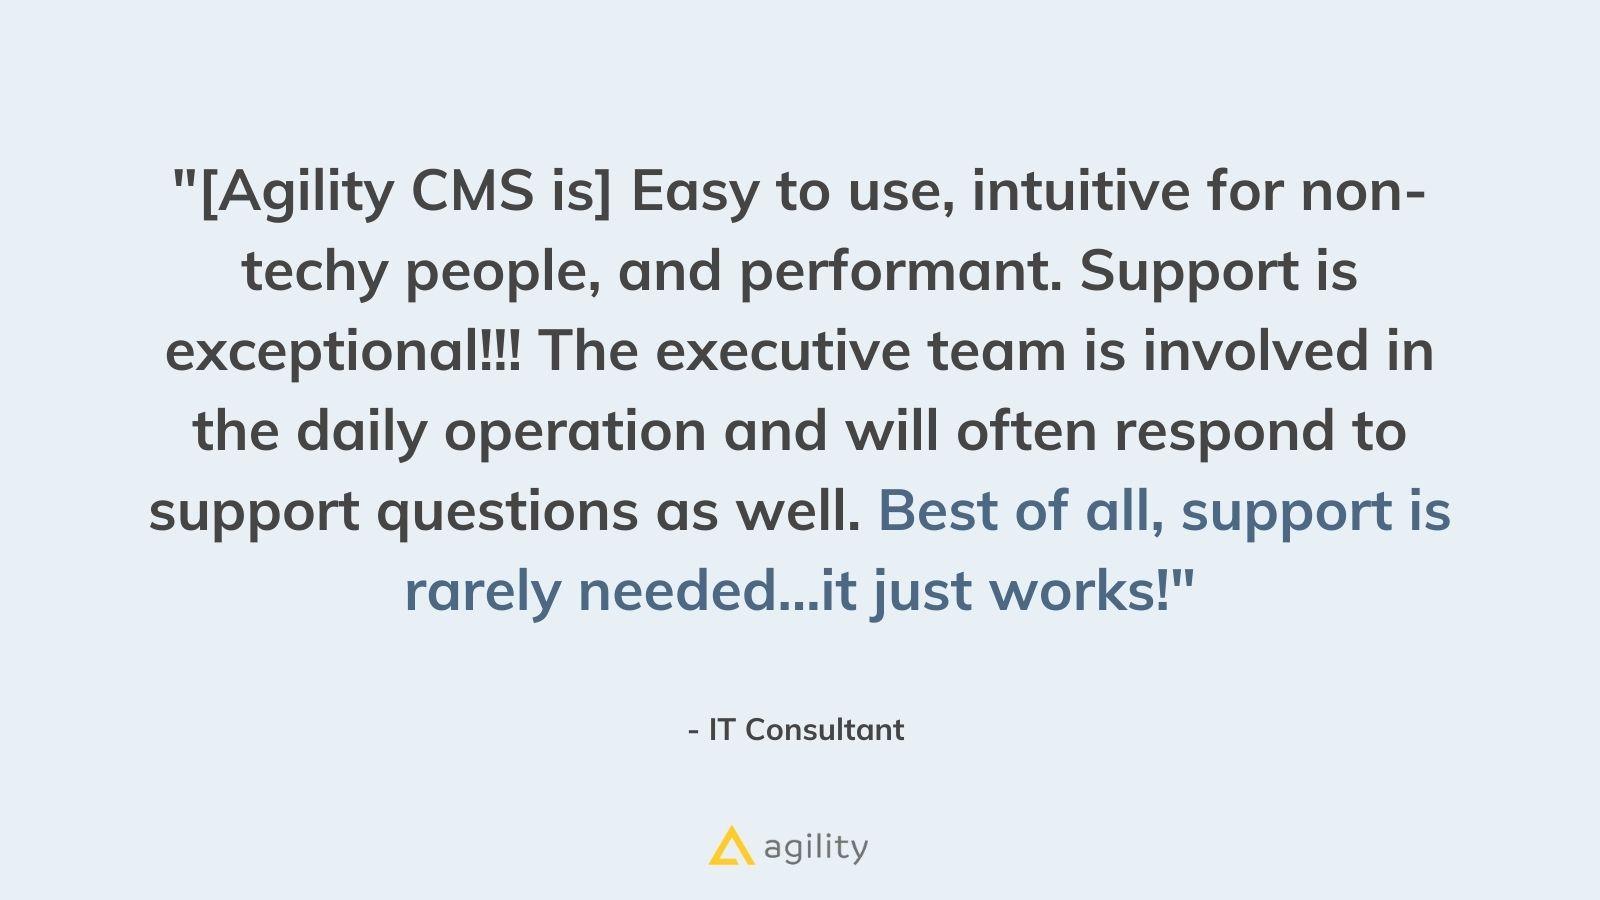 Identifying tasks on agilitycms.com